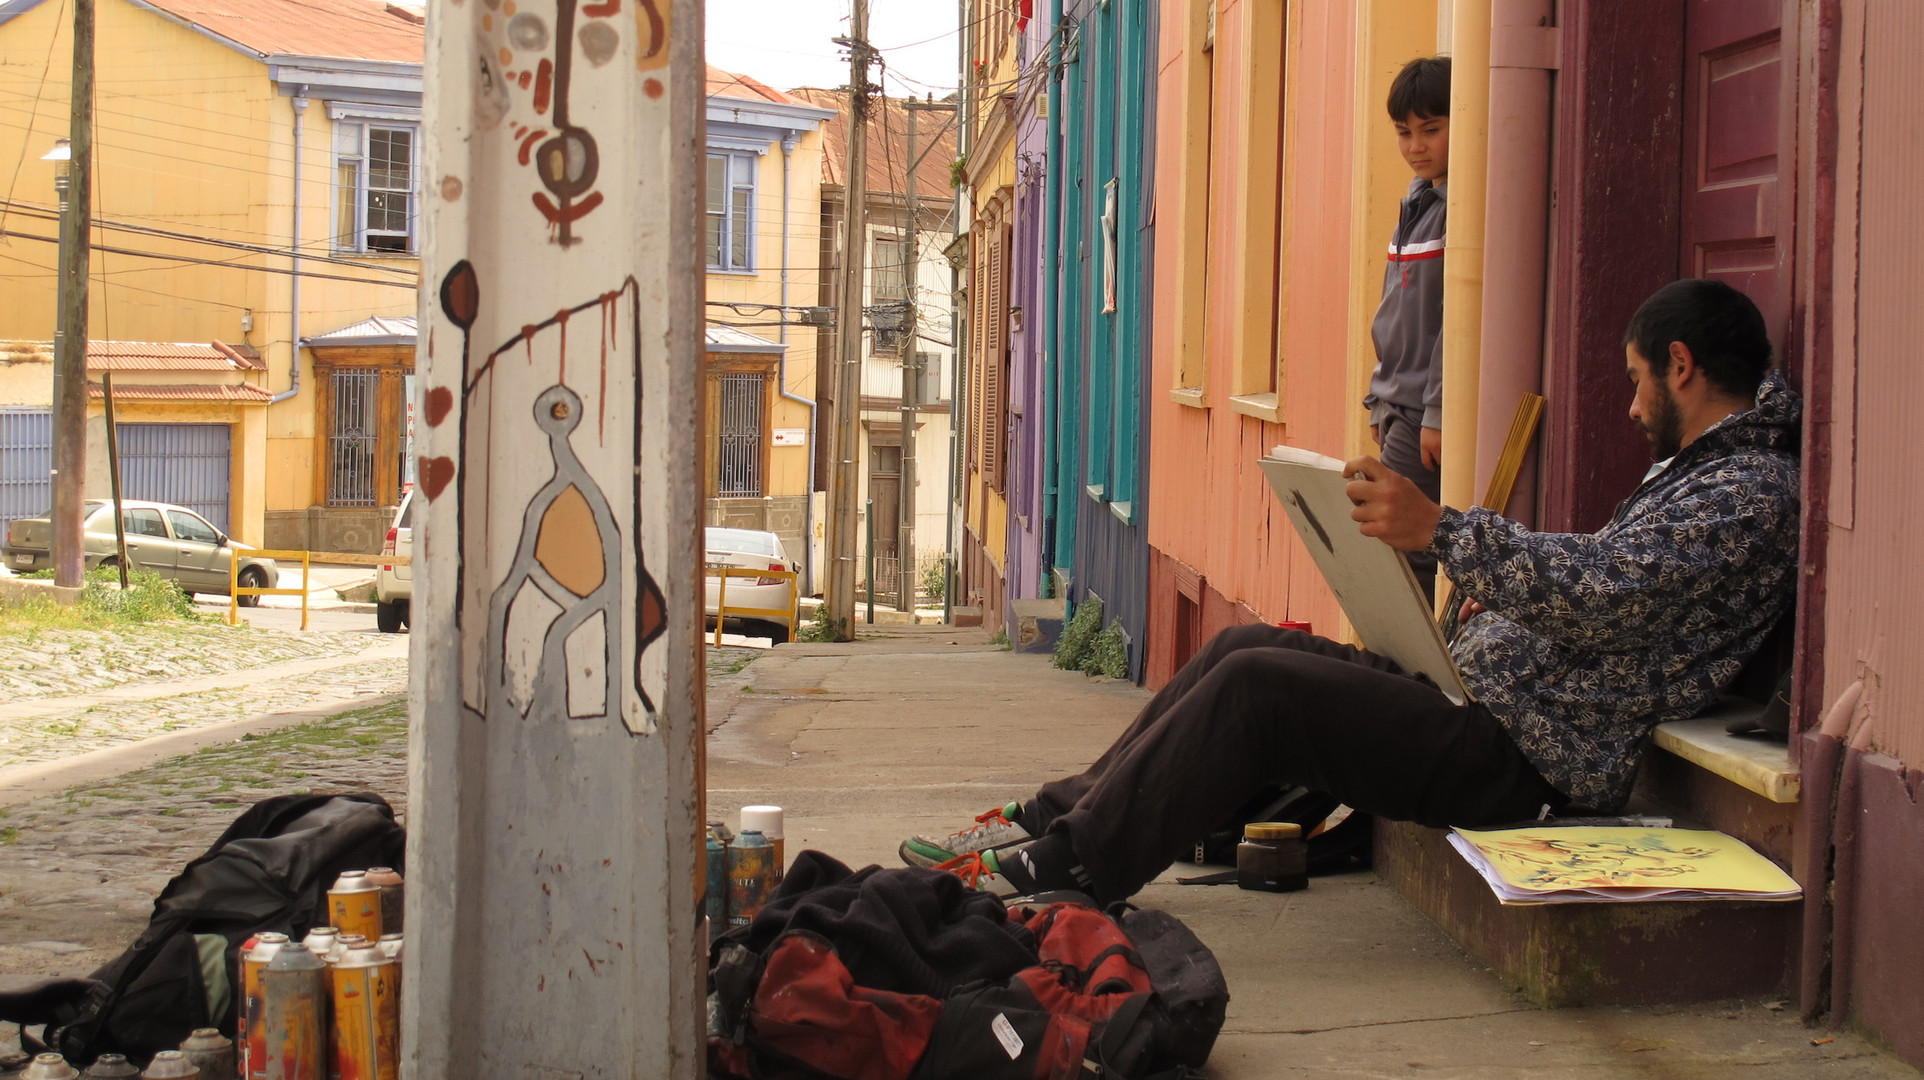 Valparaiso | Chile, 2011